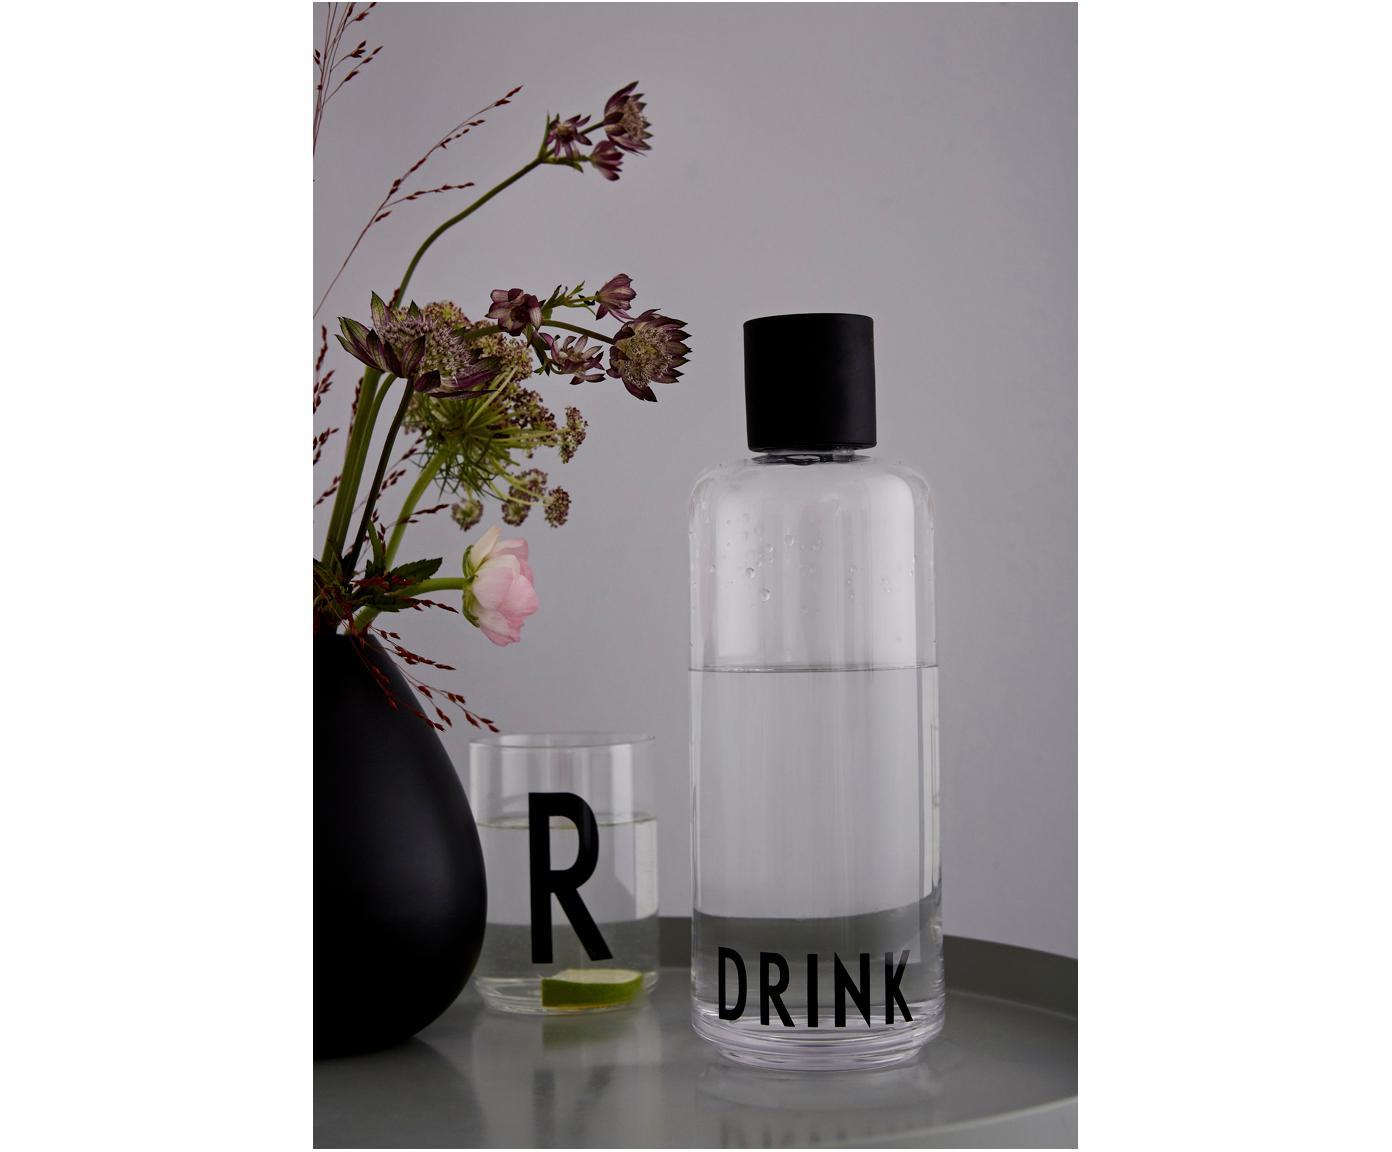 Design Karaffe Daily Drink mit Schriftzug, Transparent, 1 L